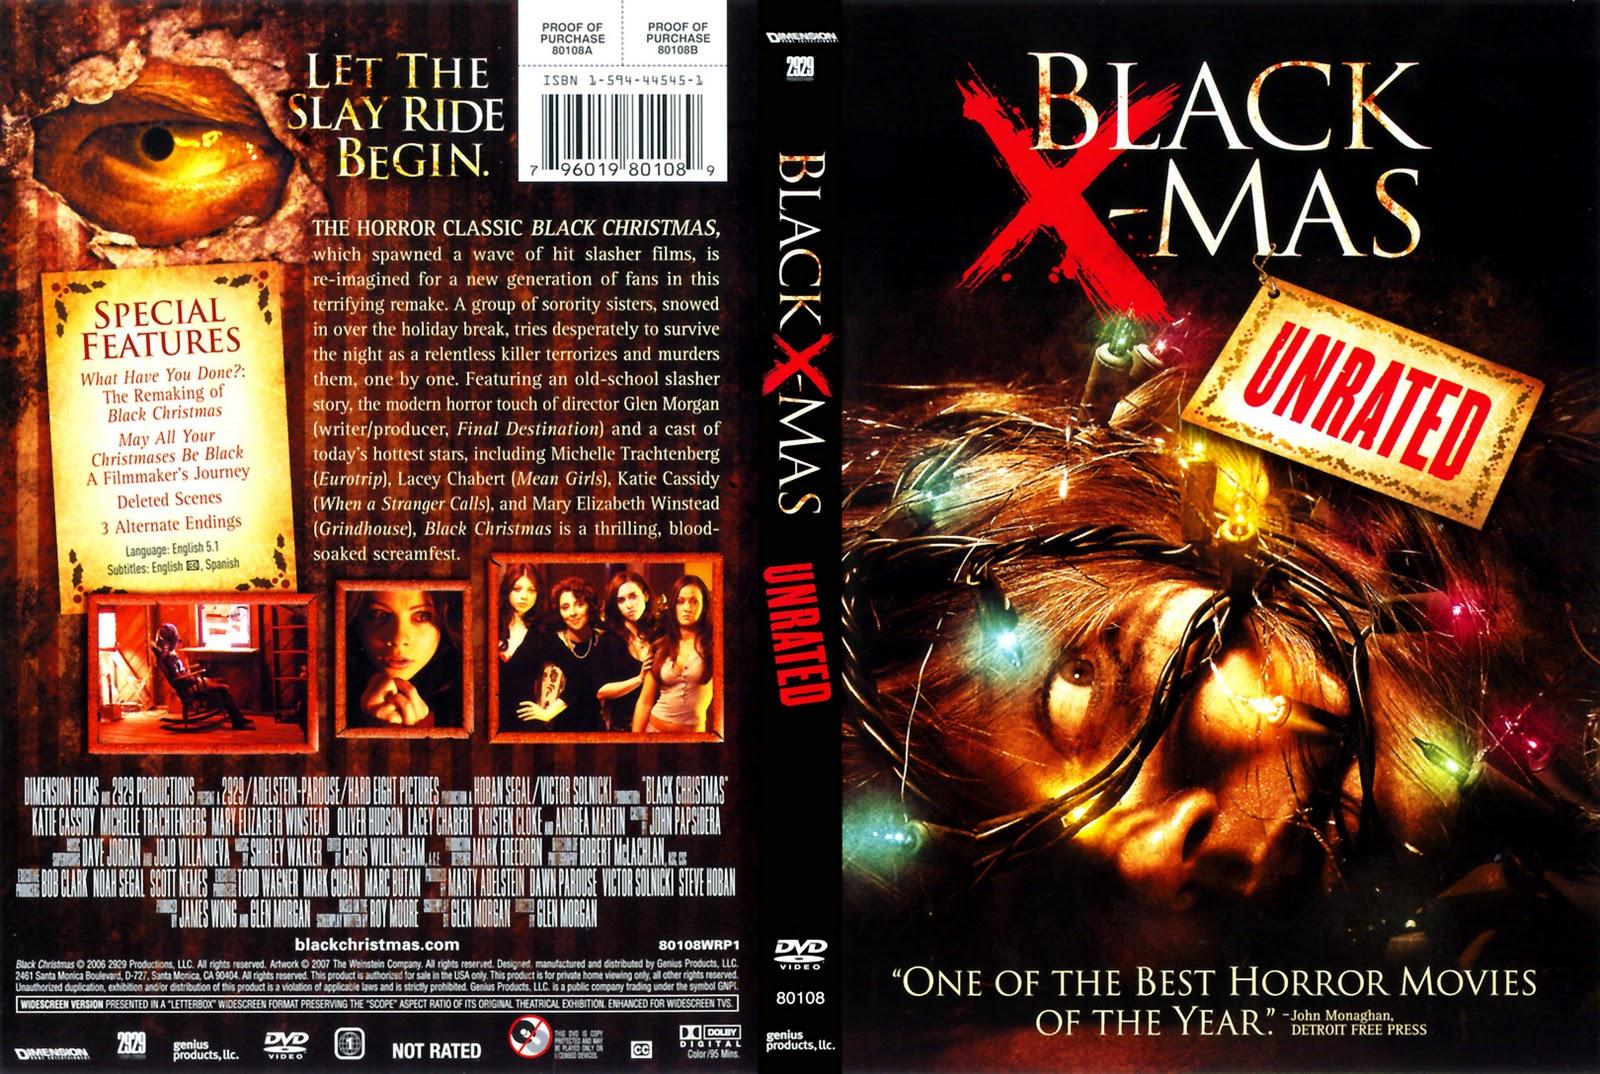 dvd review black christmas 2006 - Black Christmas 2006